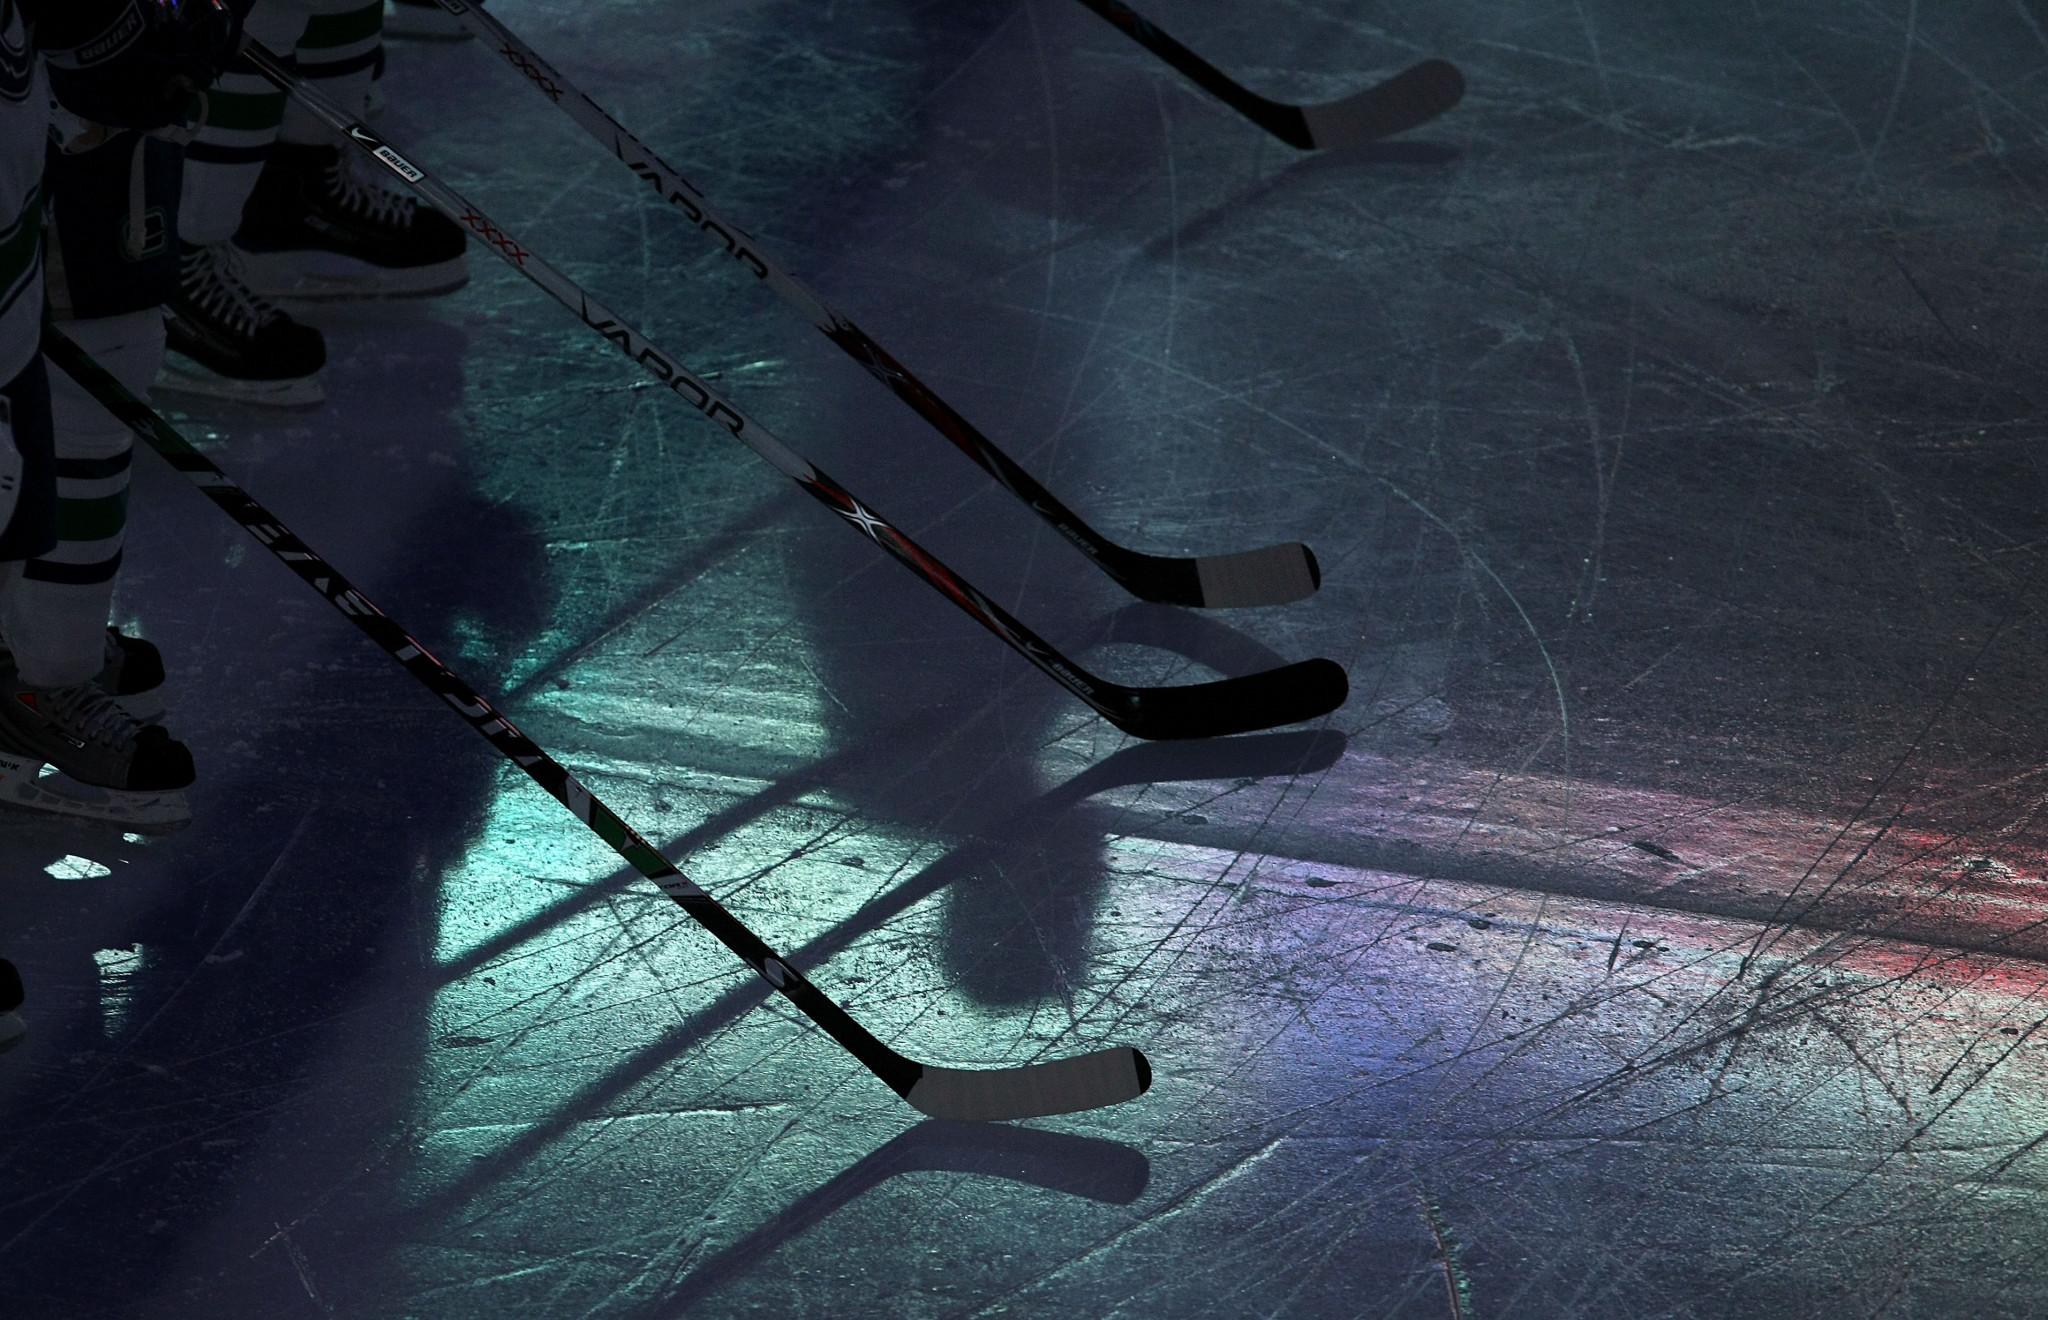 Ukrainian ice hockey player Denyskin given maximum three-game ban for racism